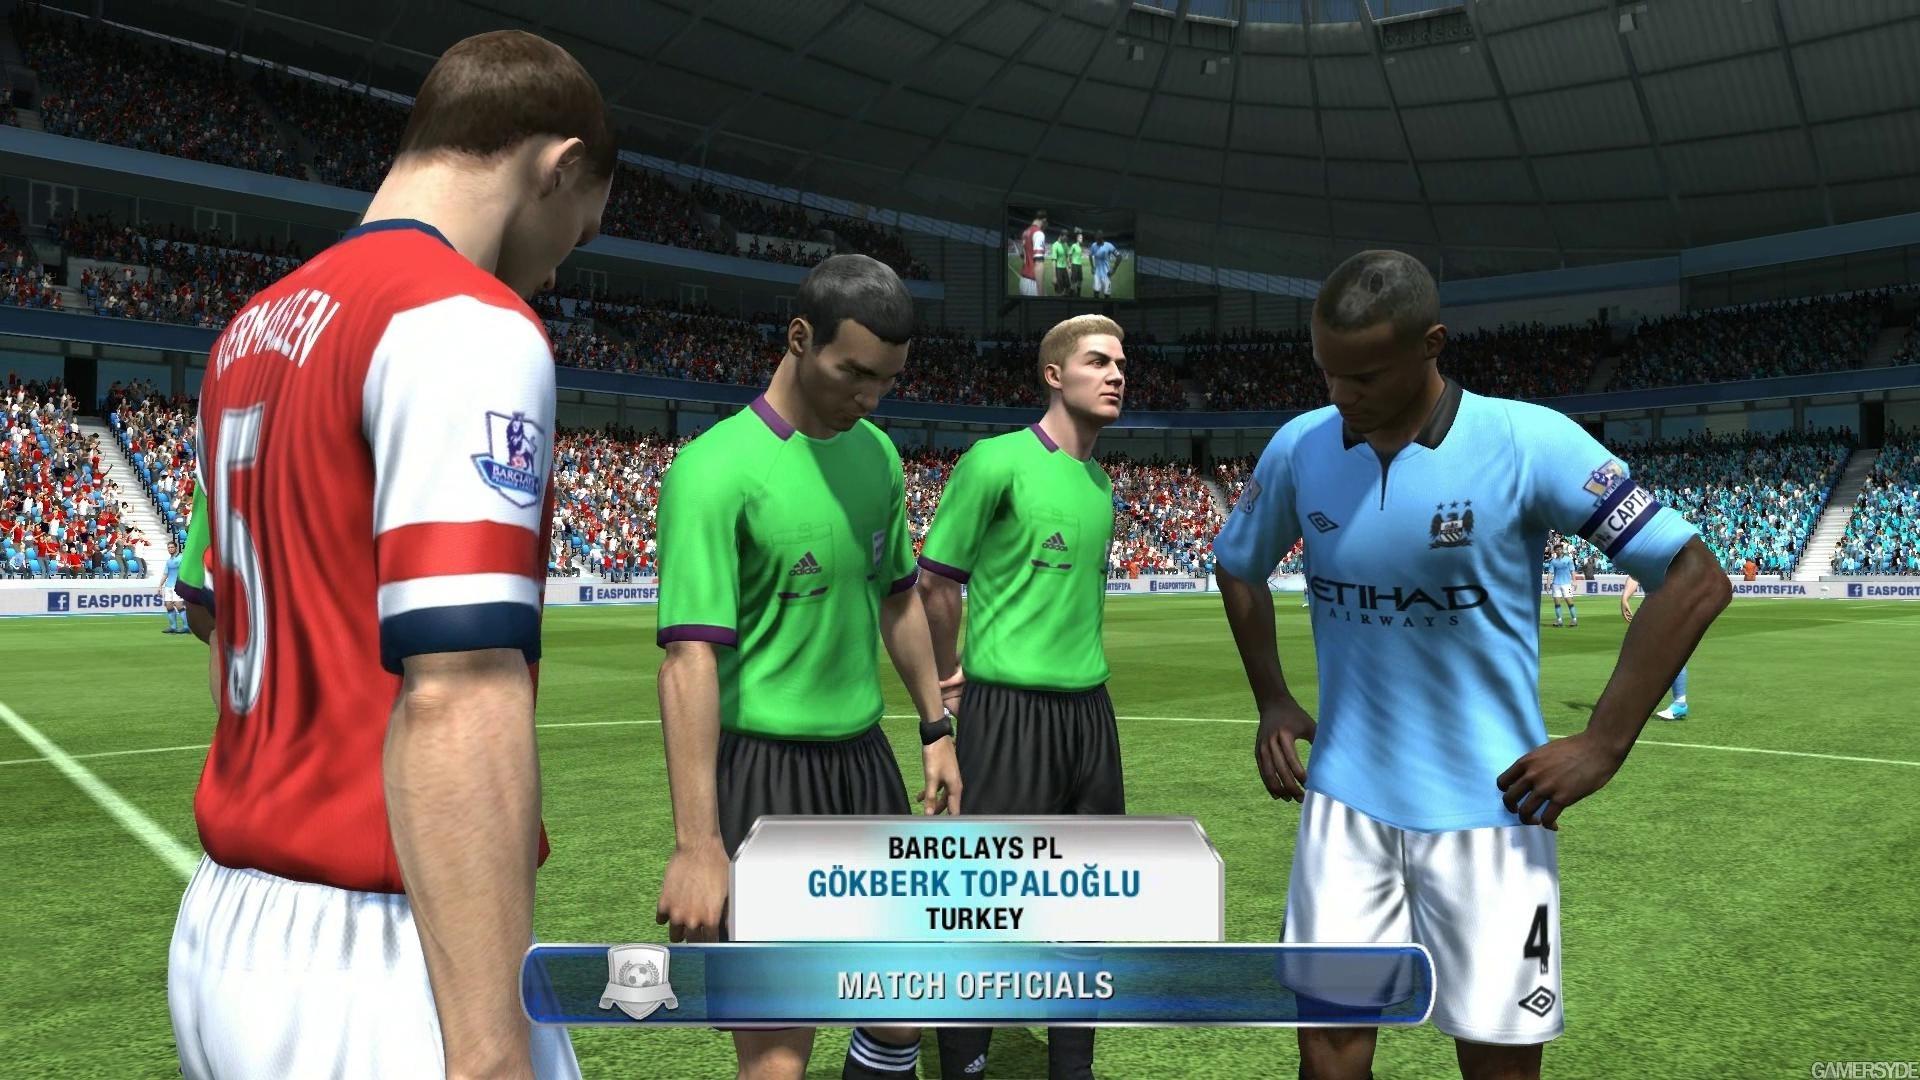 image fifa 13 20261 2509 0010 تصاویر جدید از بازی FIFA 13